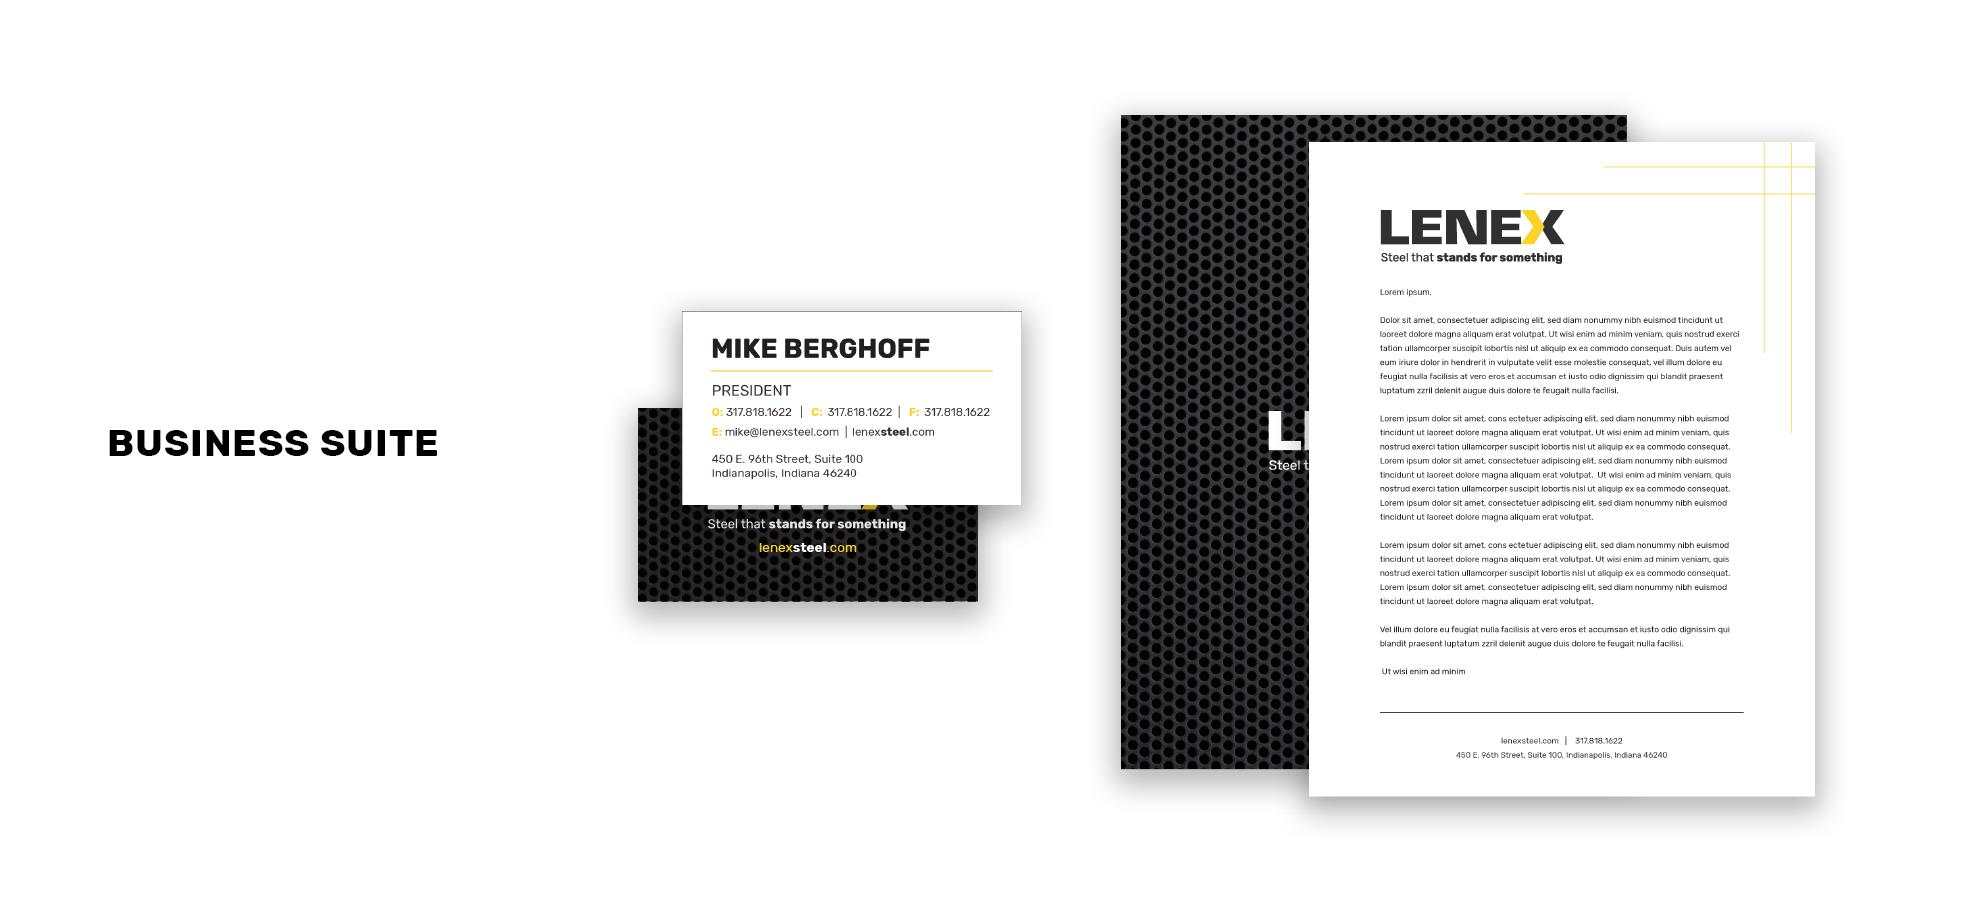 Lenex Case Study Pic1Artboard 3 Brand Guideline and Logo Refresh: Lenex Steel